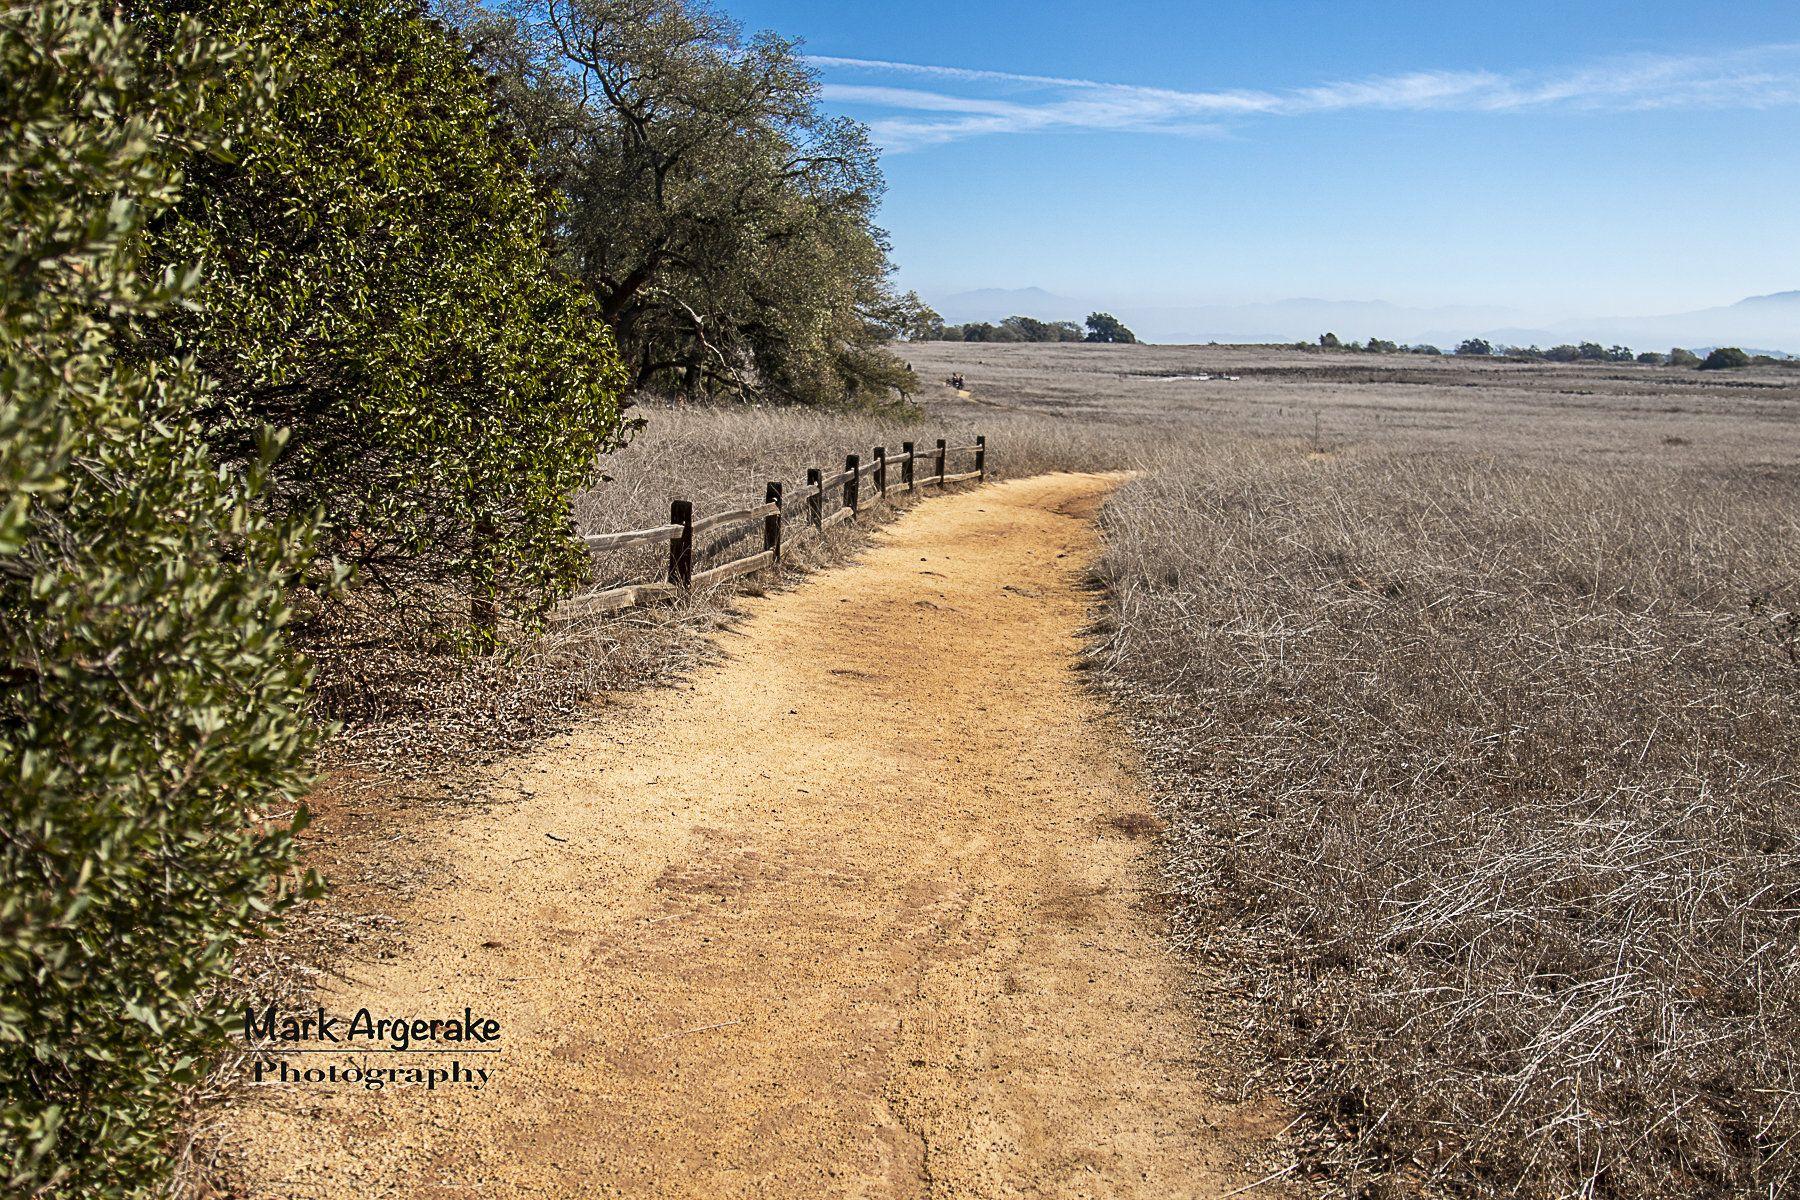 Santa Rosa Plateau In Murrieta California Hiking Trail To The Vernal Pools 4x6 Photo Postcard